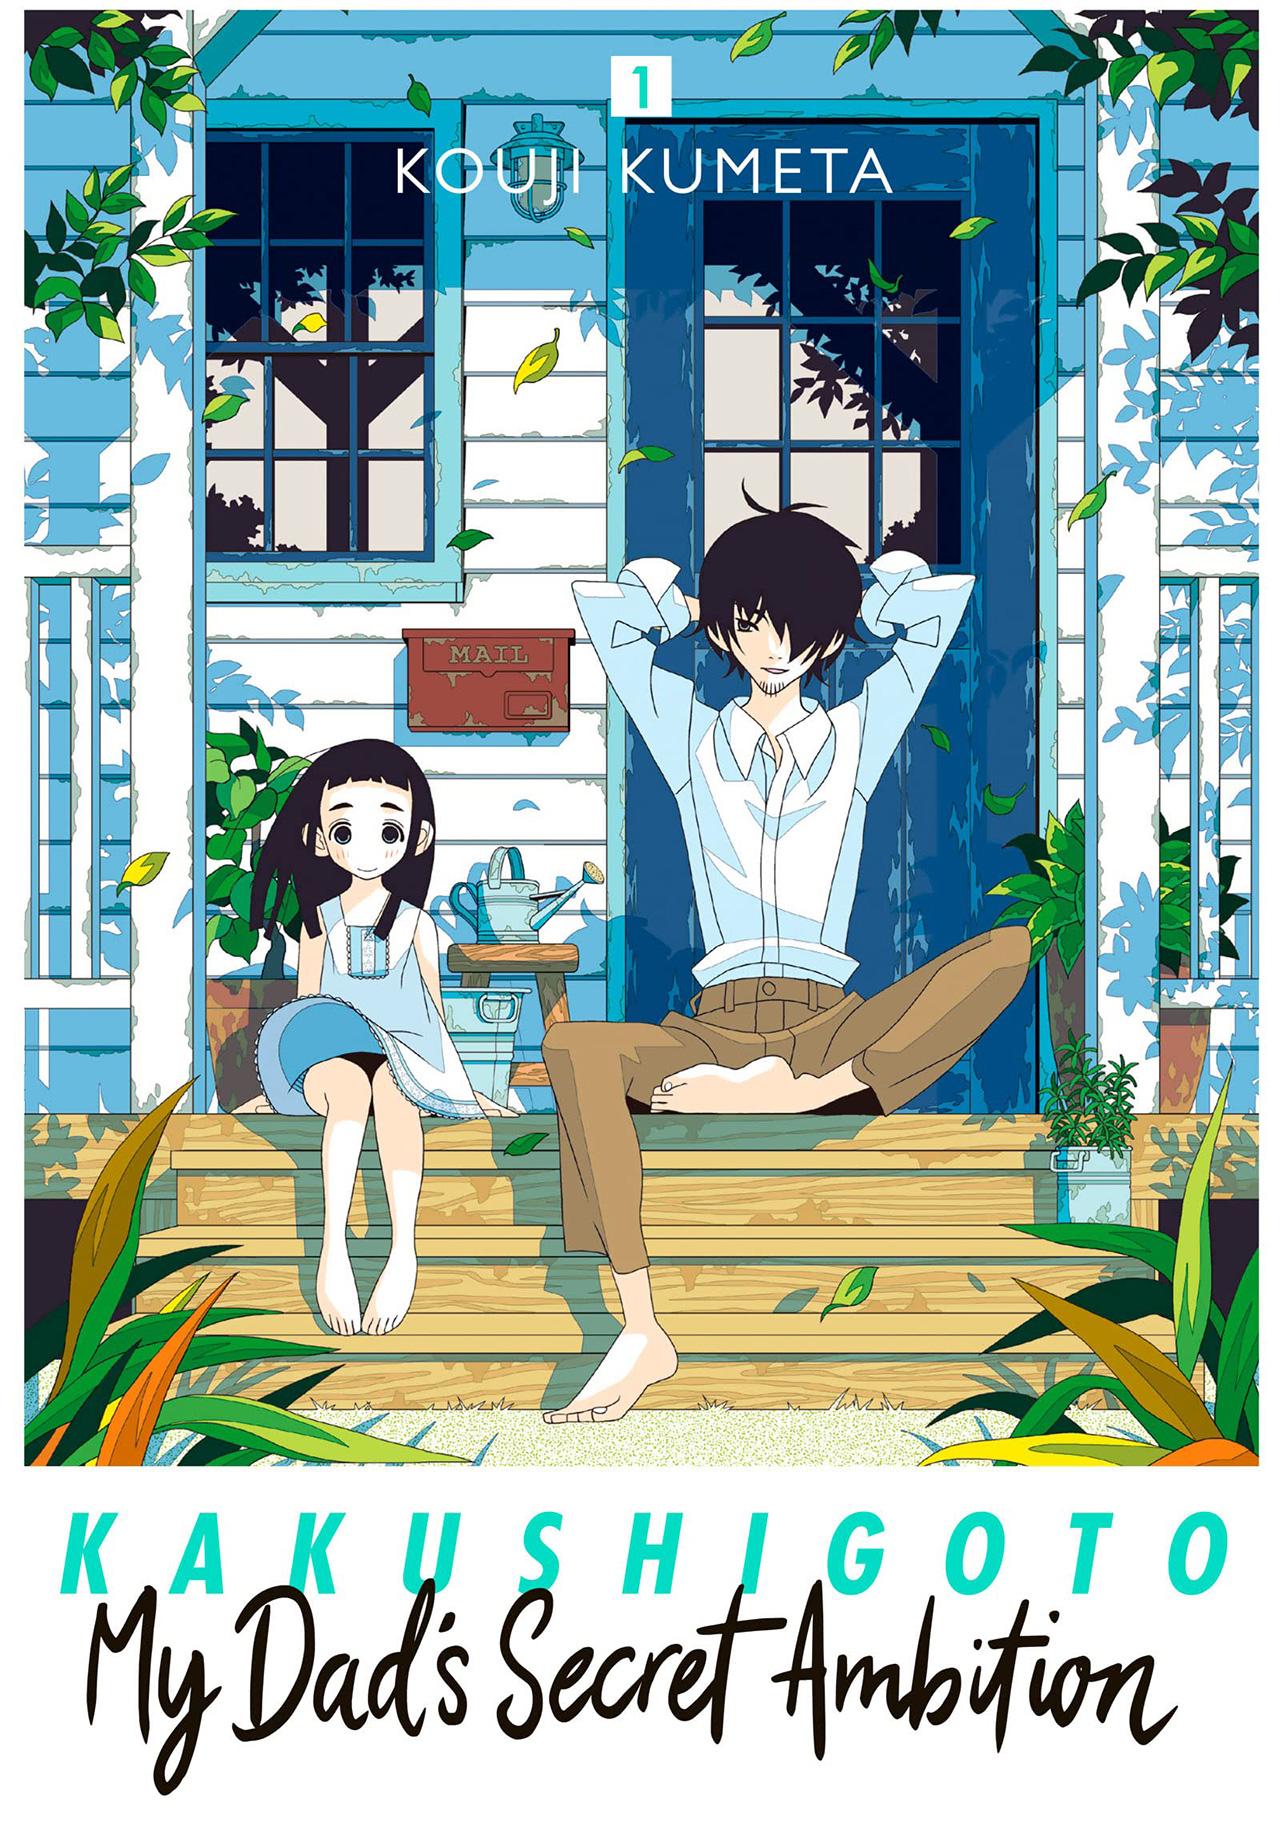 Capa do volume 1 de Kakushigoto (Kakushigoto: My Dad's Secret Ambition)